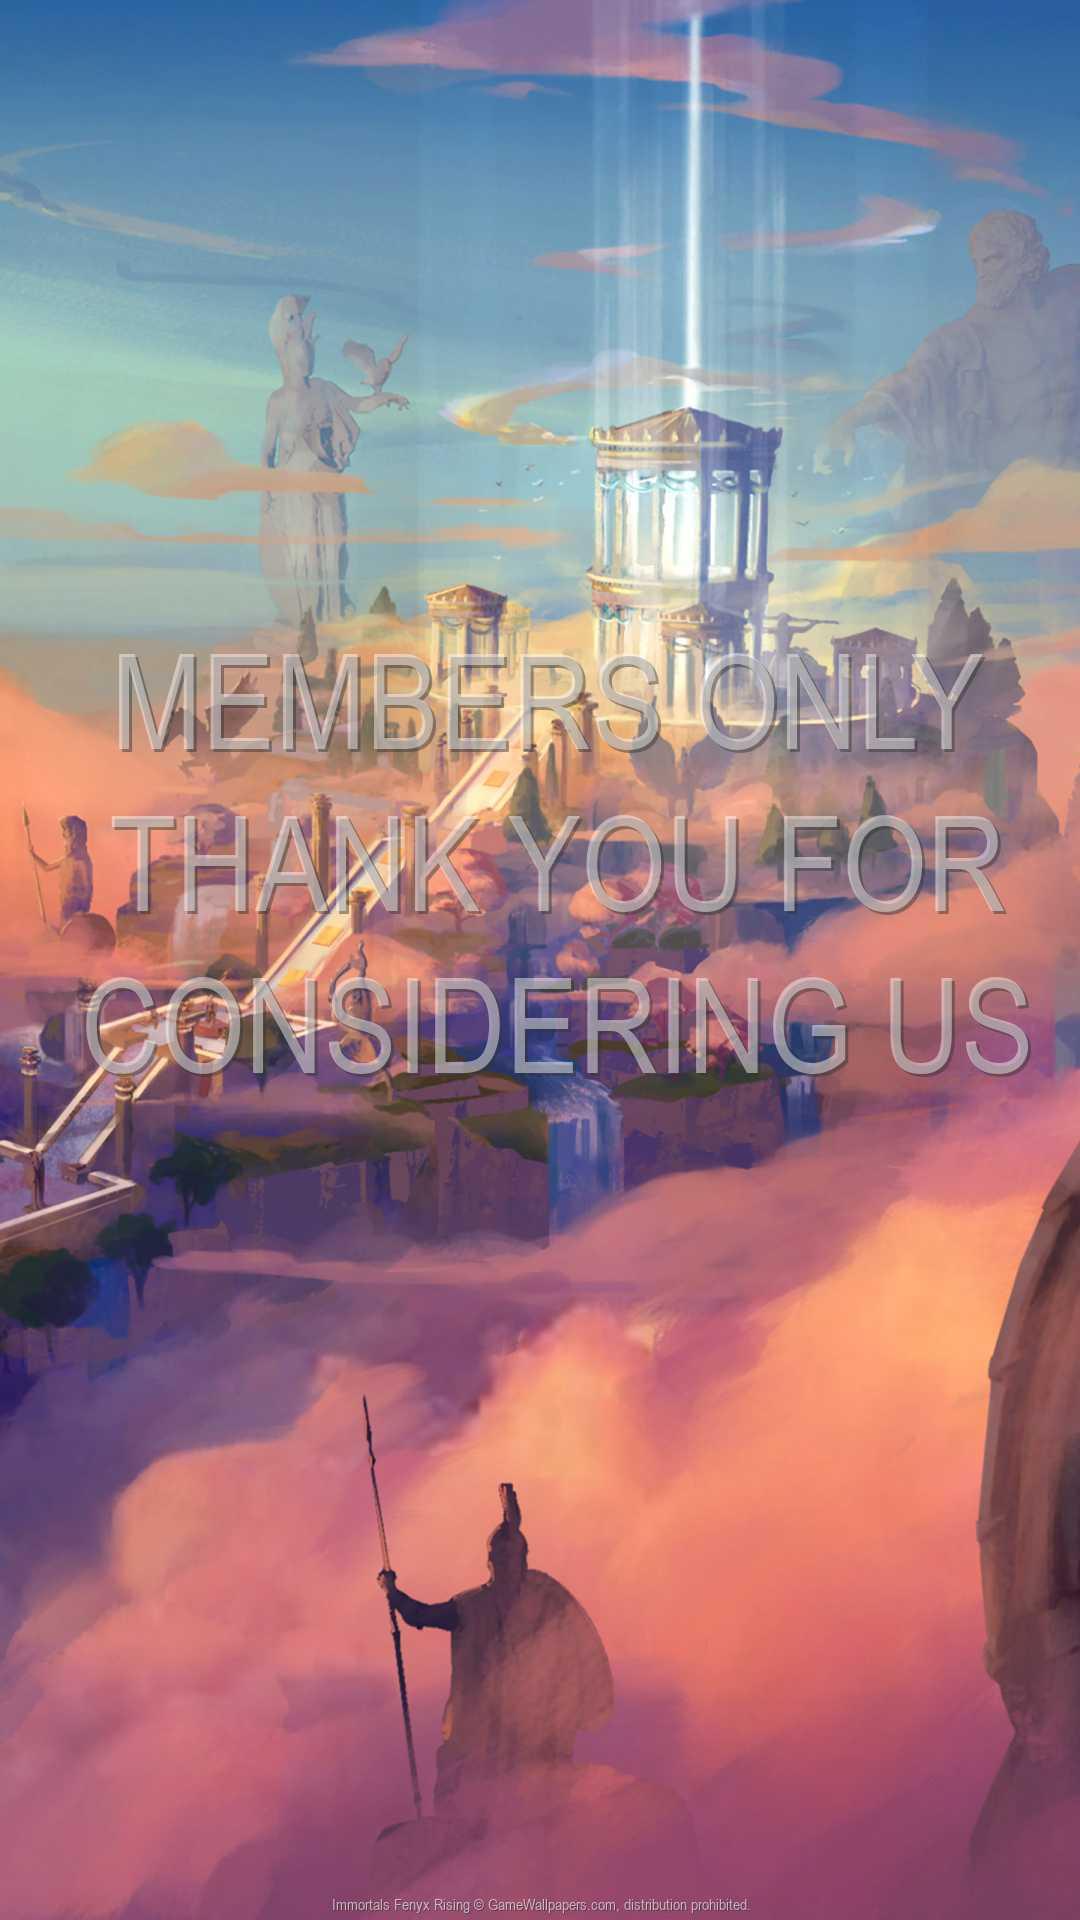 Immortals Fenyx Rising 1080p Vertical Móvil fondo de escritorio 03